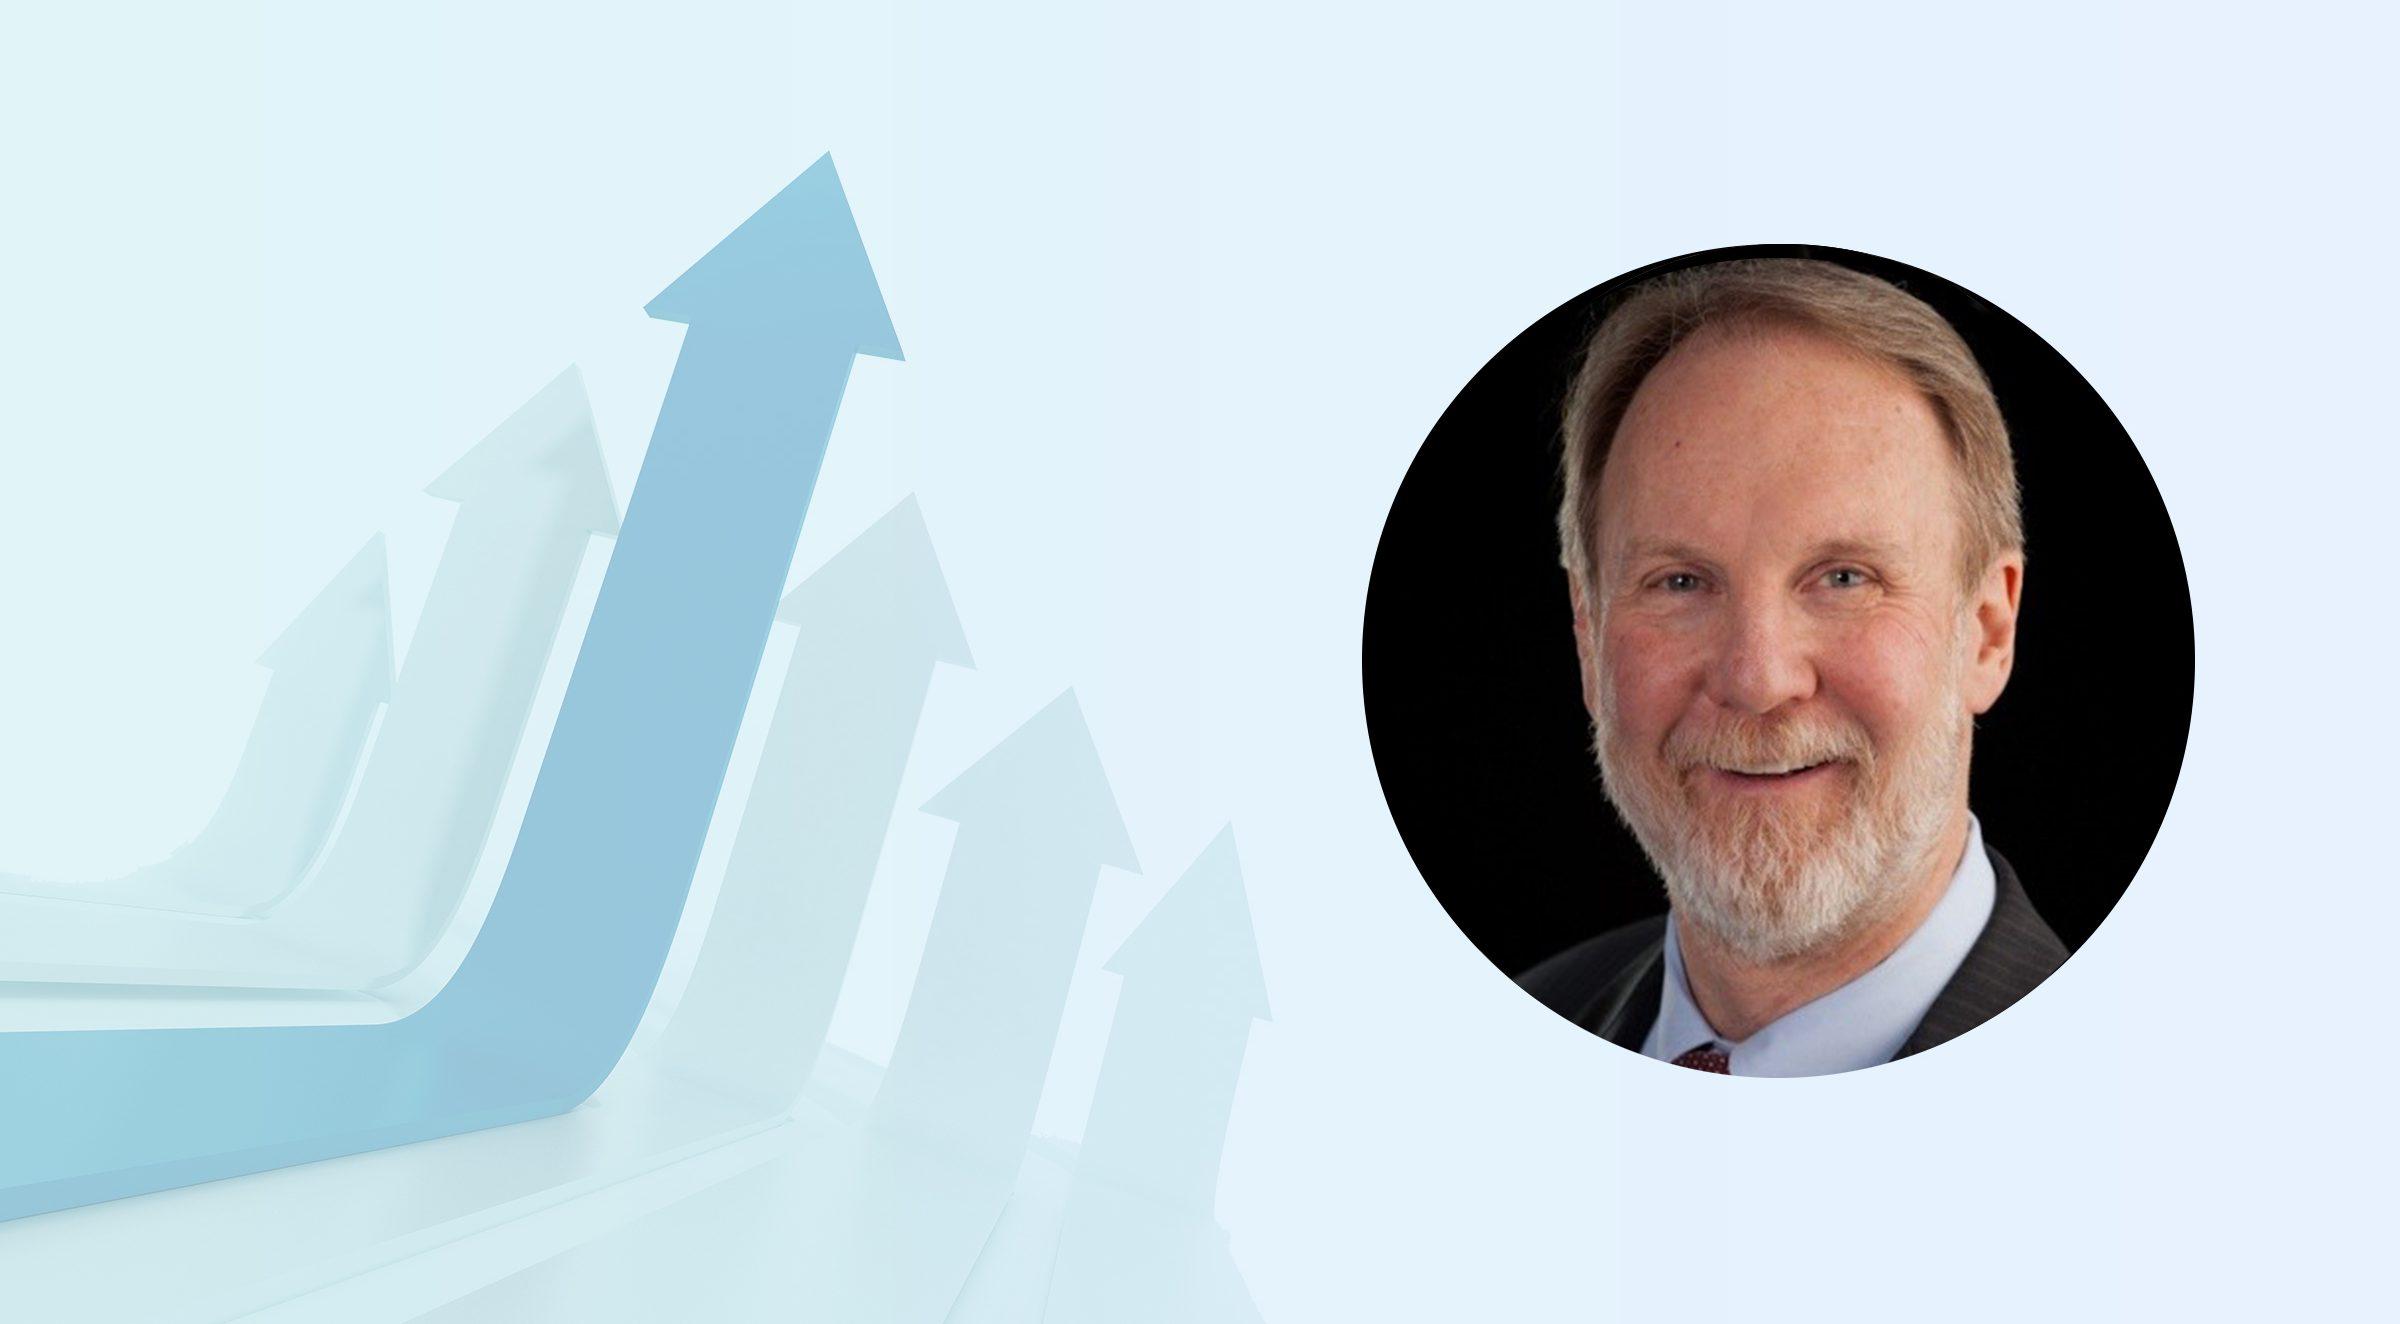 financial advisor career an interview with john panter